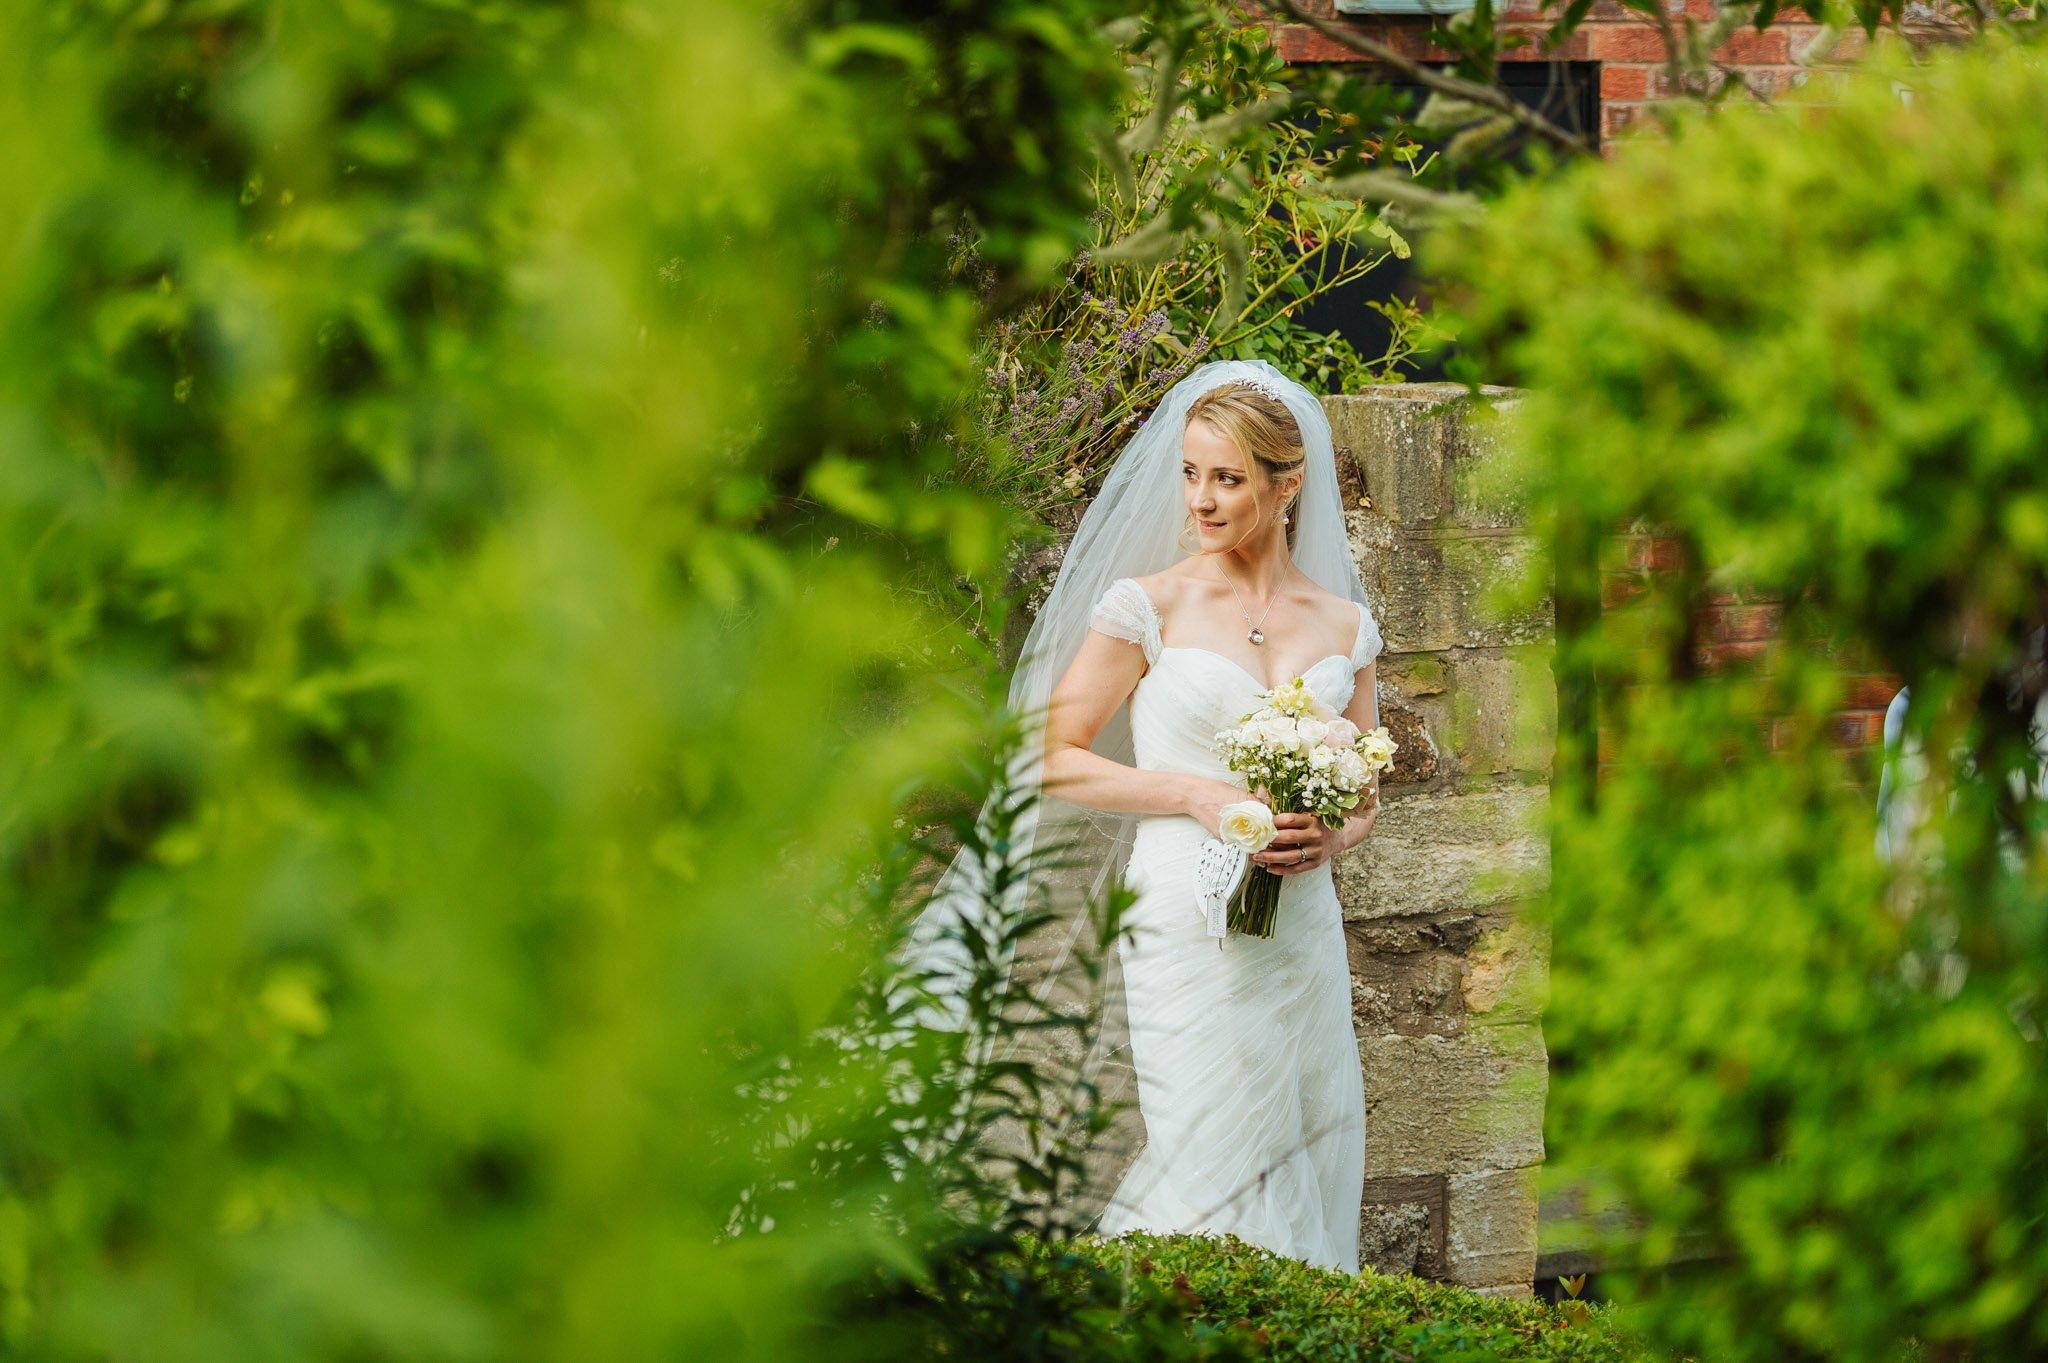 Georgina + Mike - Wedding photography in Malvern, Worcestershire 72